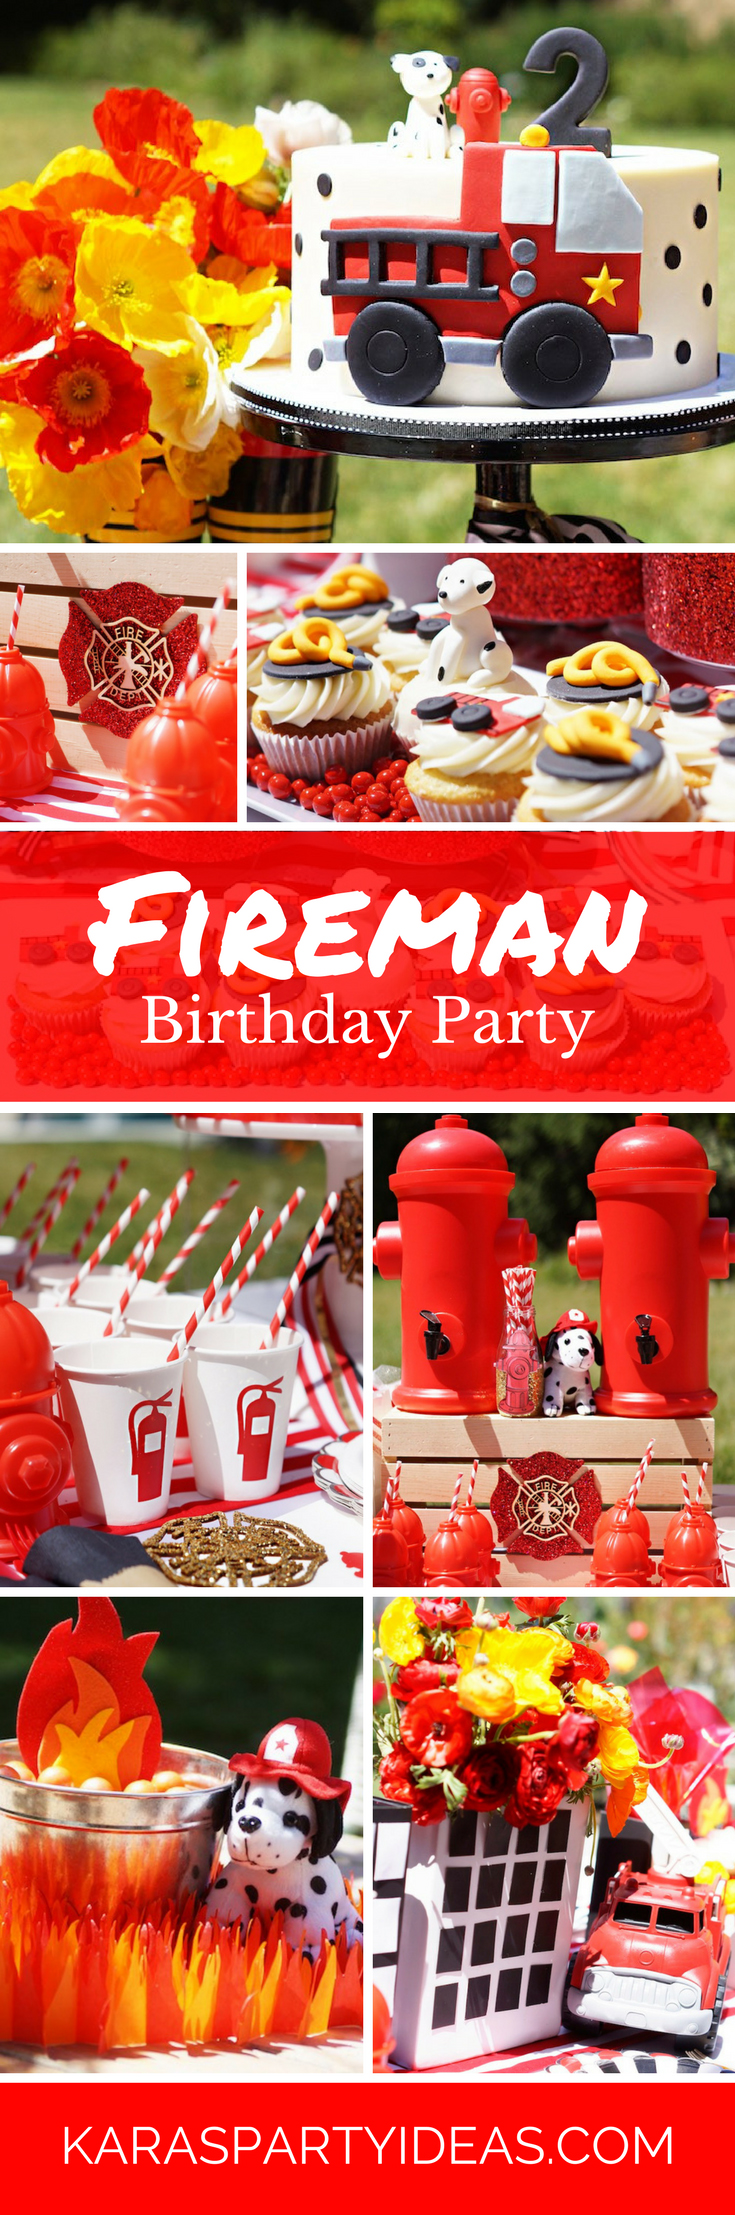 Fireman Birthday Party via Kara's Party Ideas - KarasPartyIdeas.com